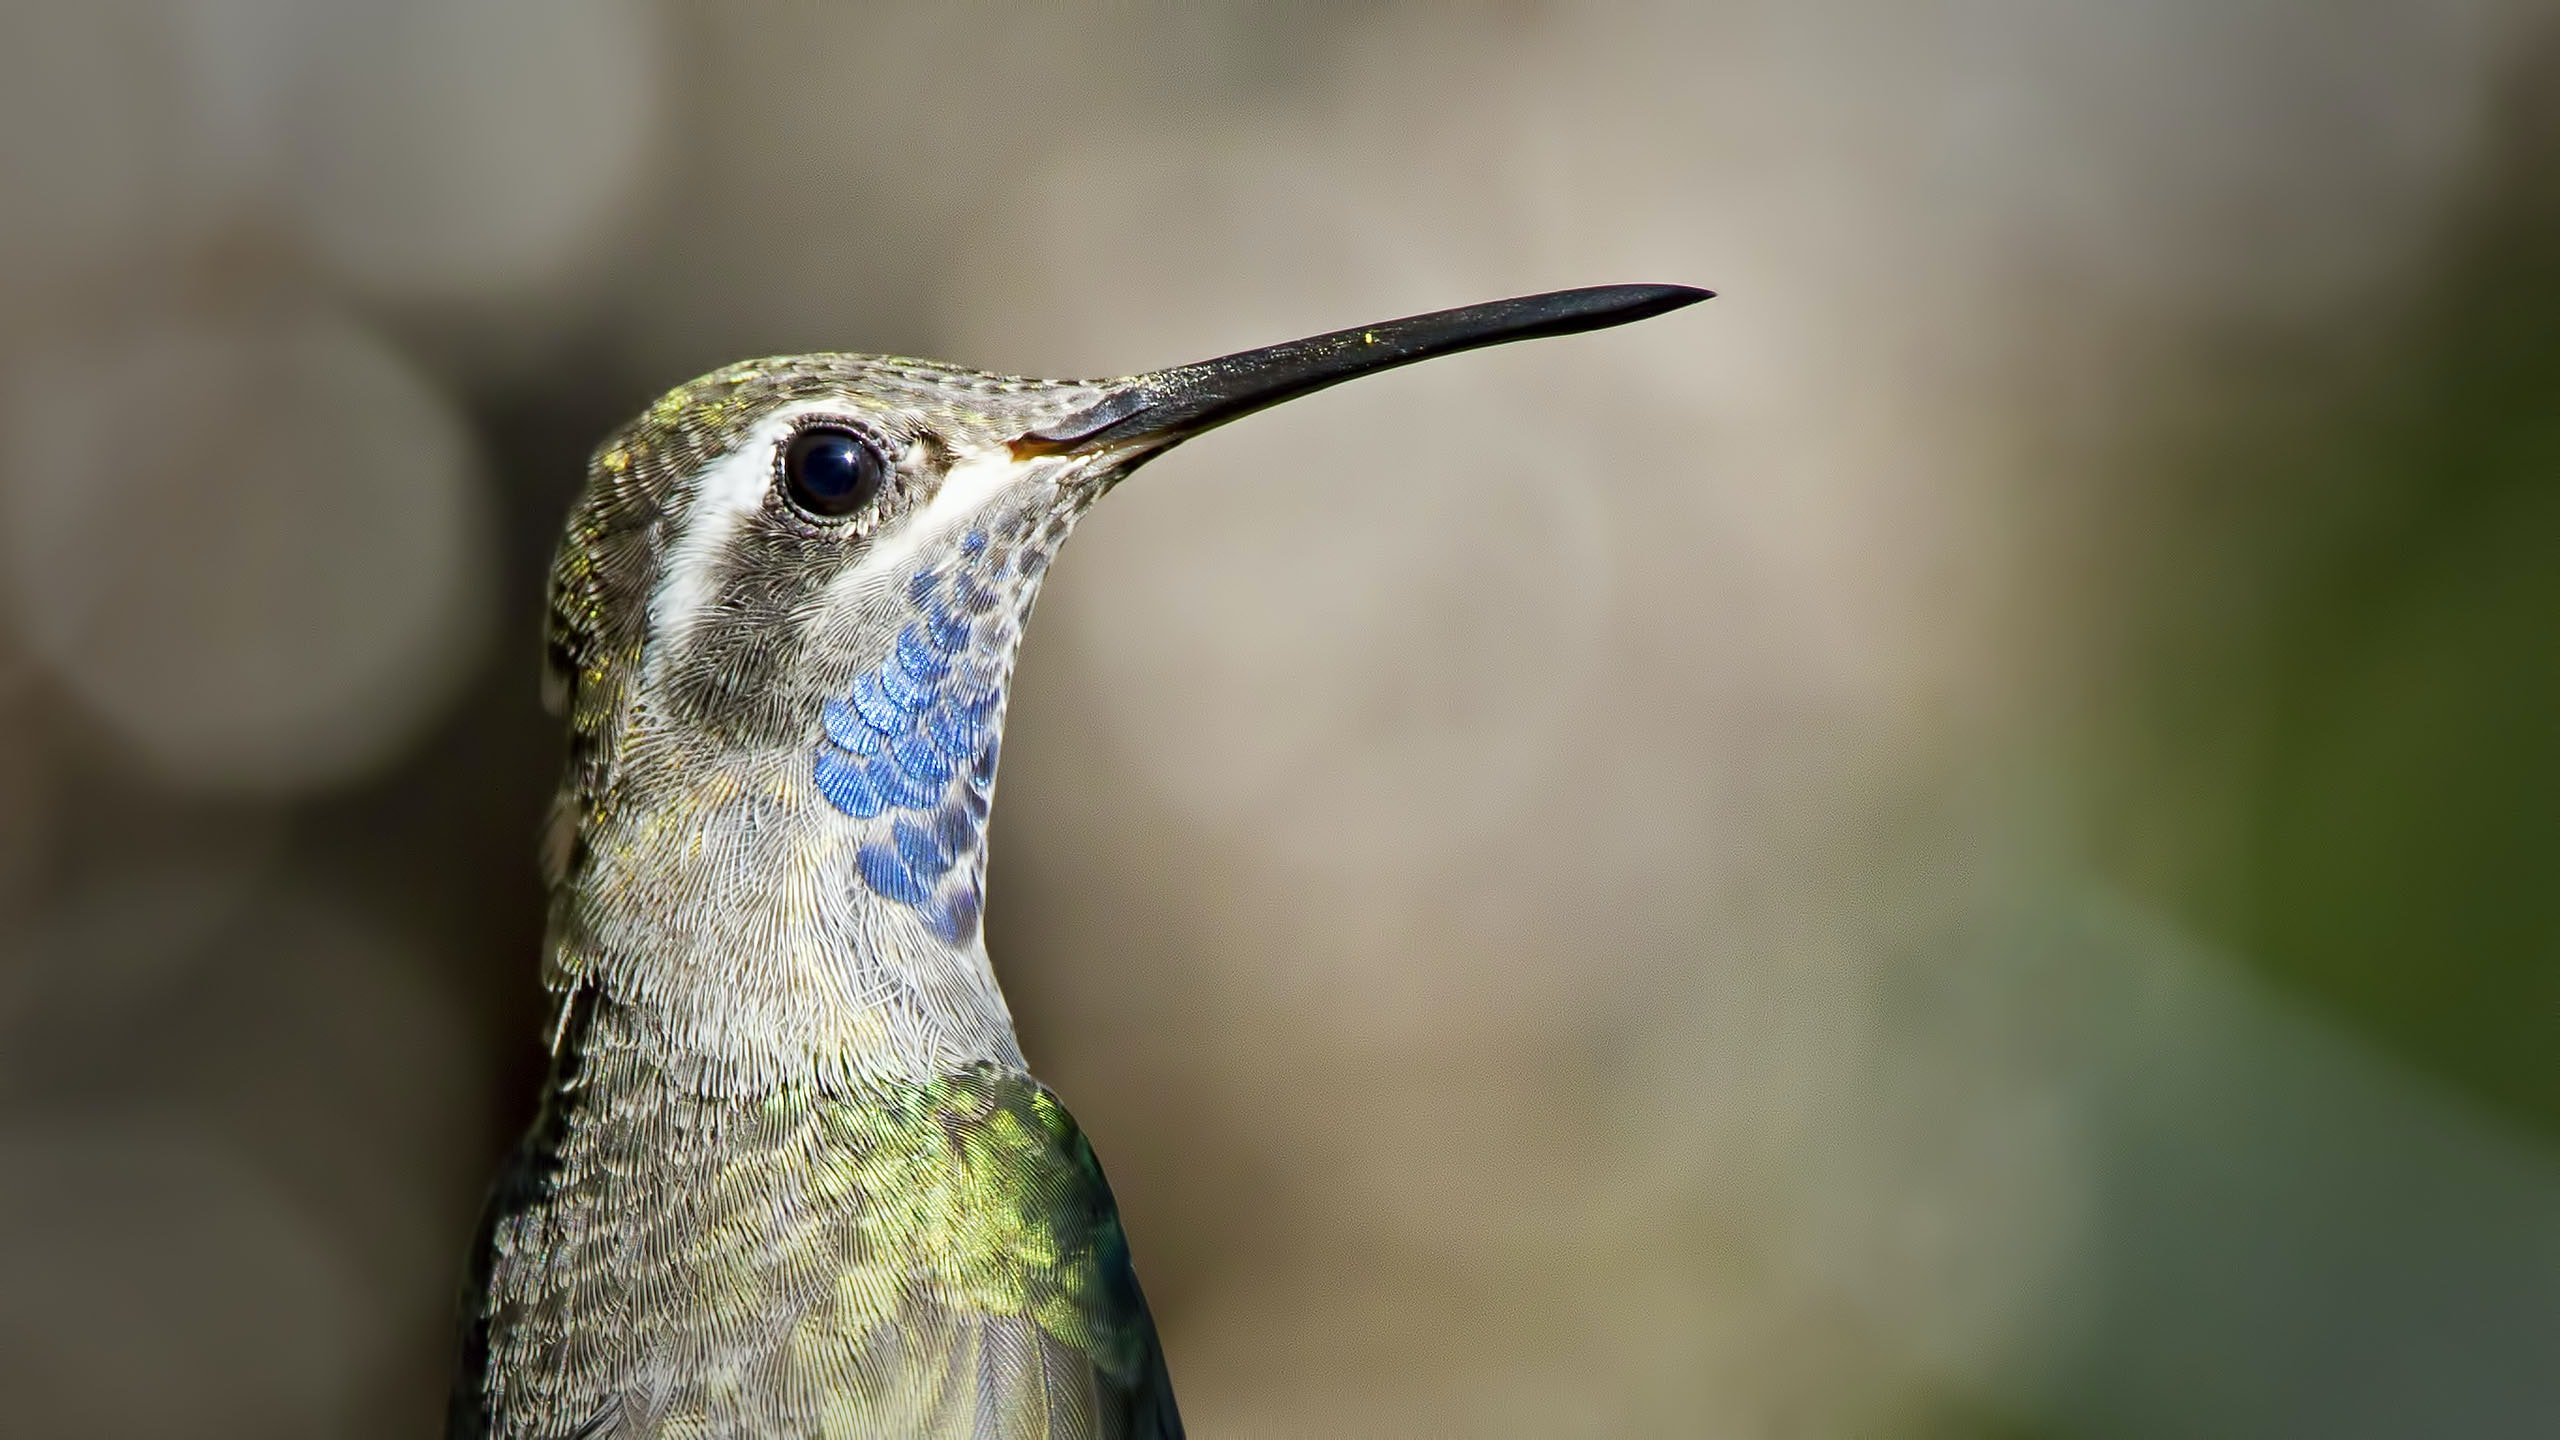 gray and blue humming bird